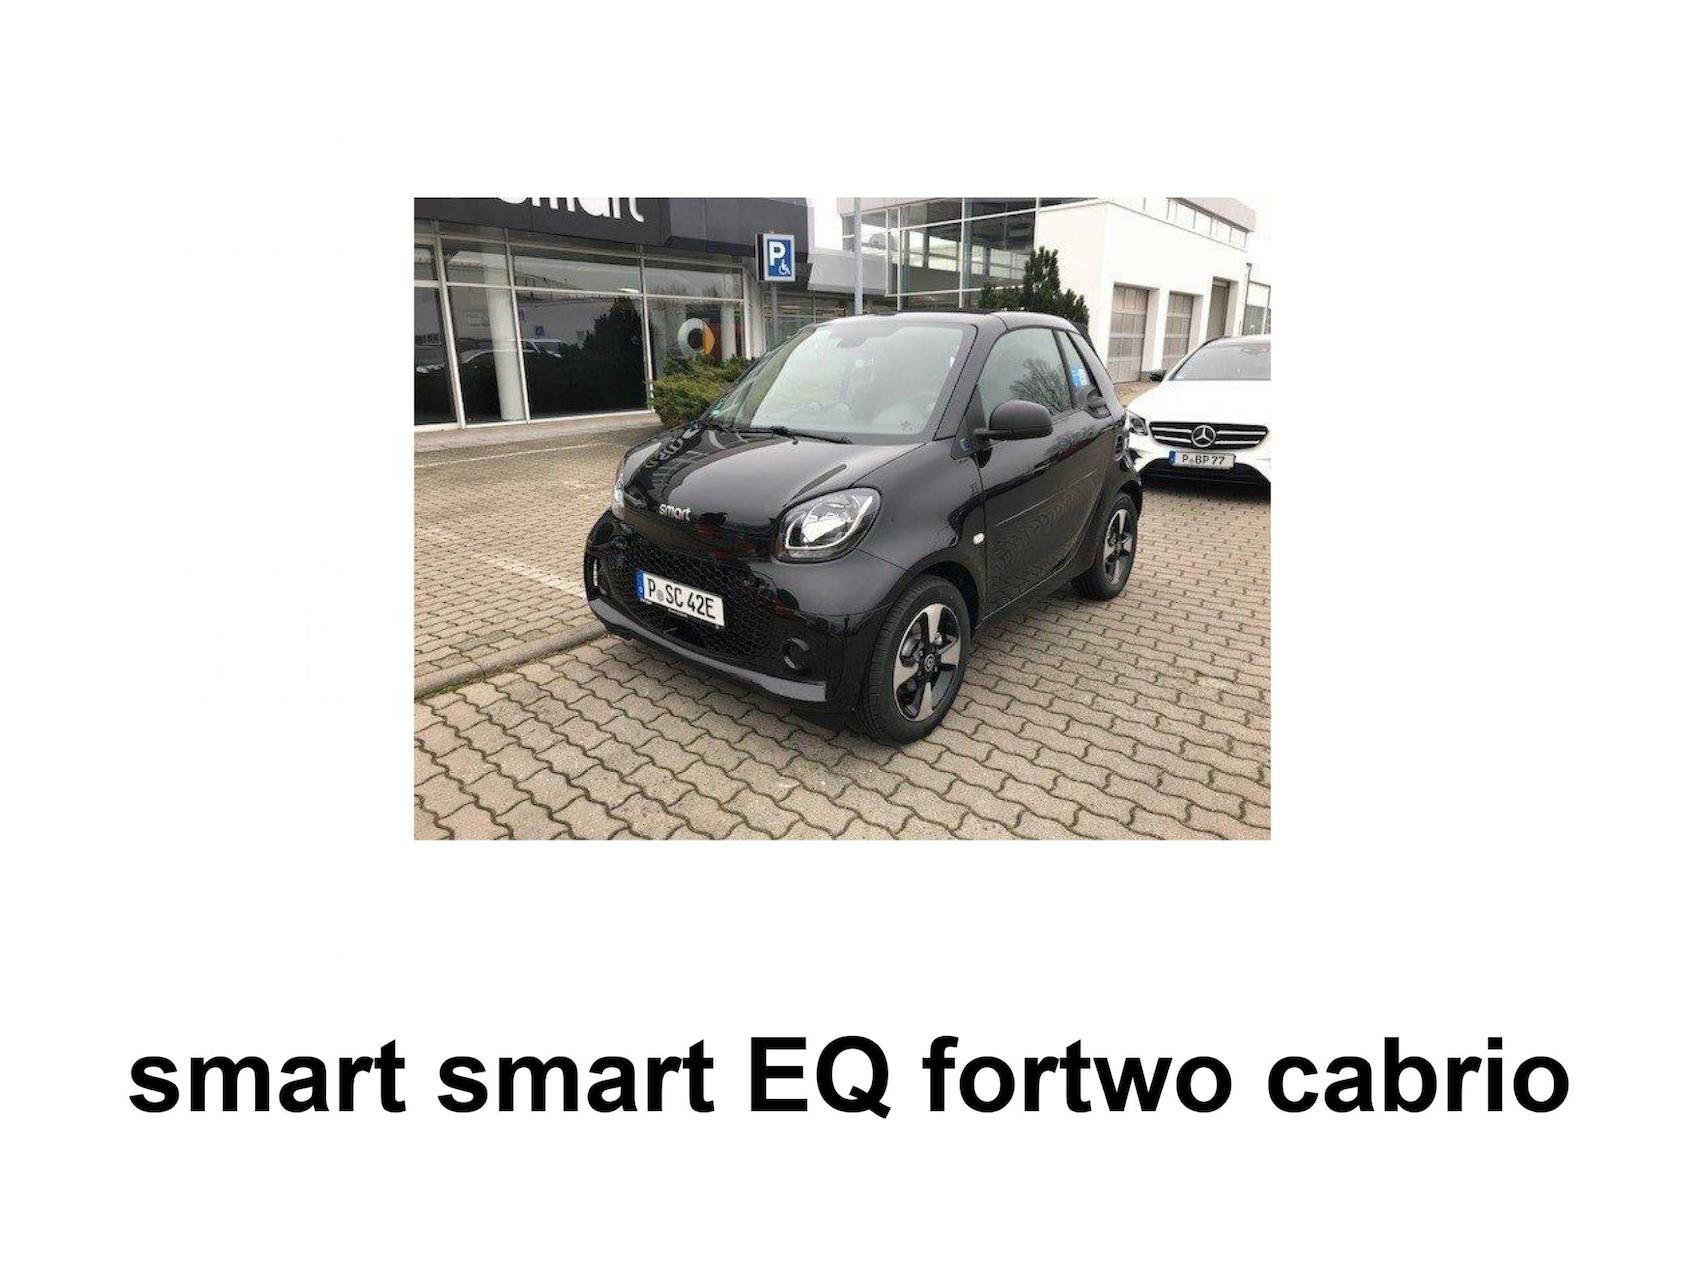 angebot-sc-Potsdam-smart-eq-fortwo-cabrio-exposee